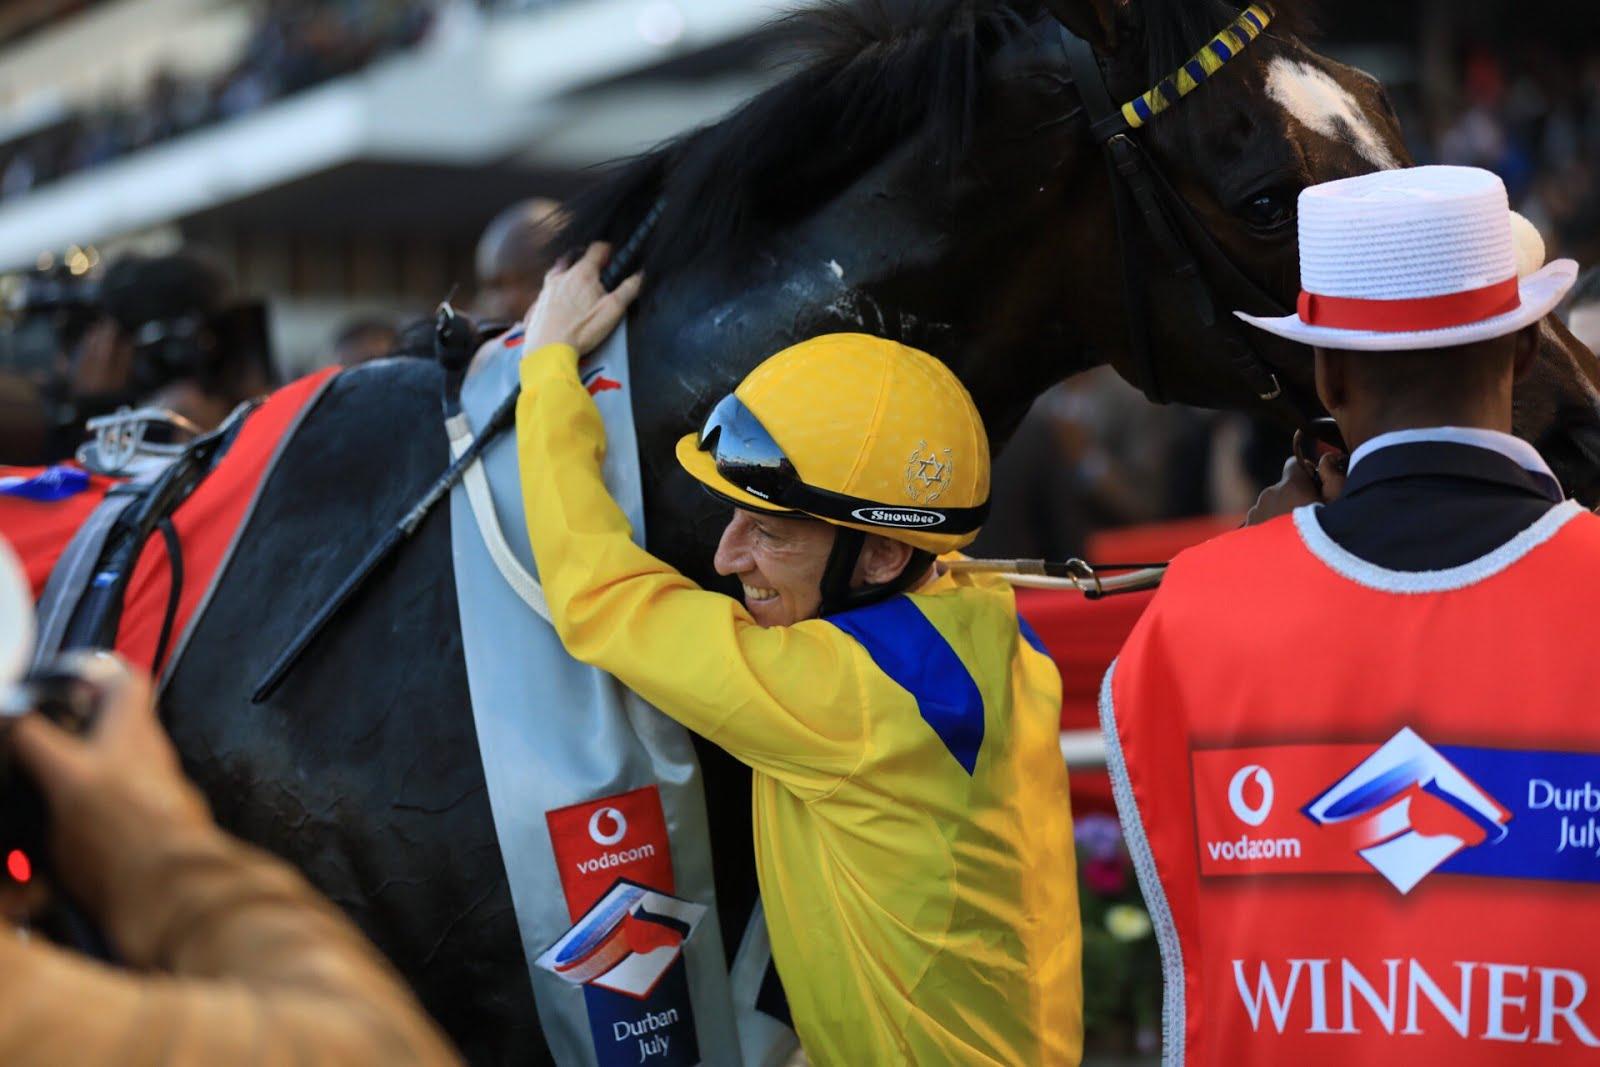 Anton Marcus hugging Do It Again - Vodacom Durban July 2018 - Winner - Horse Racing